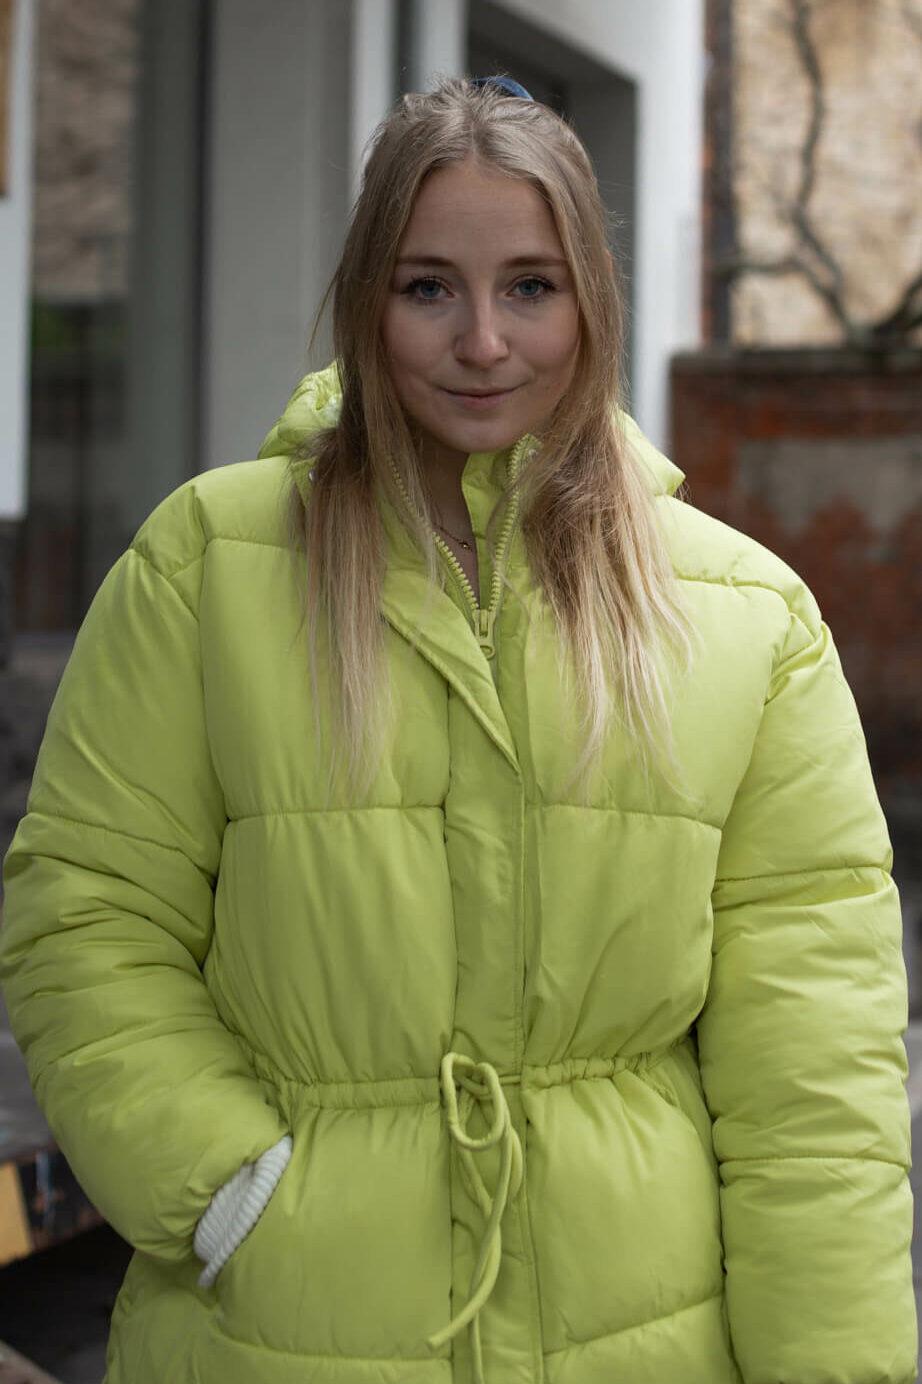 Neon grüne Jacke Neonfarben